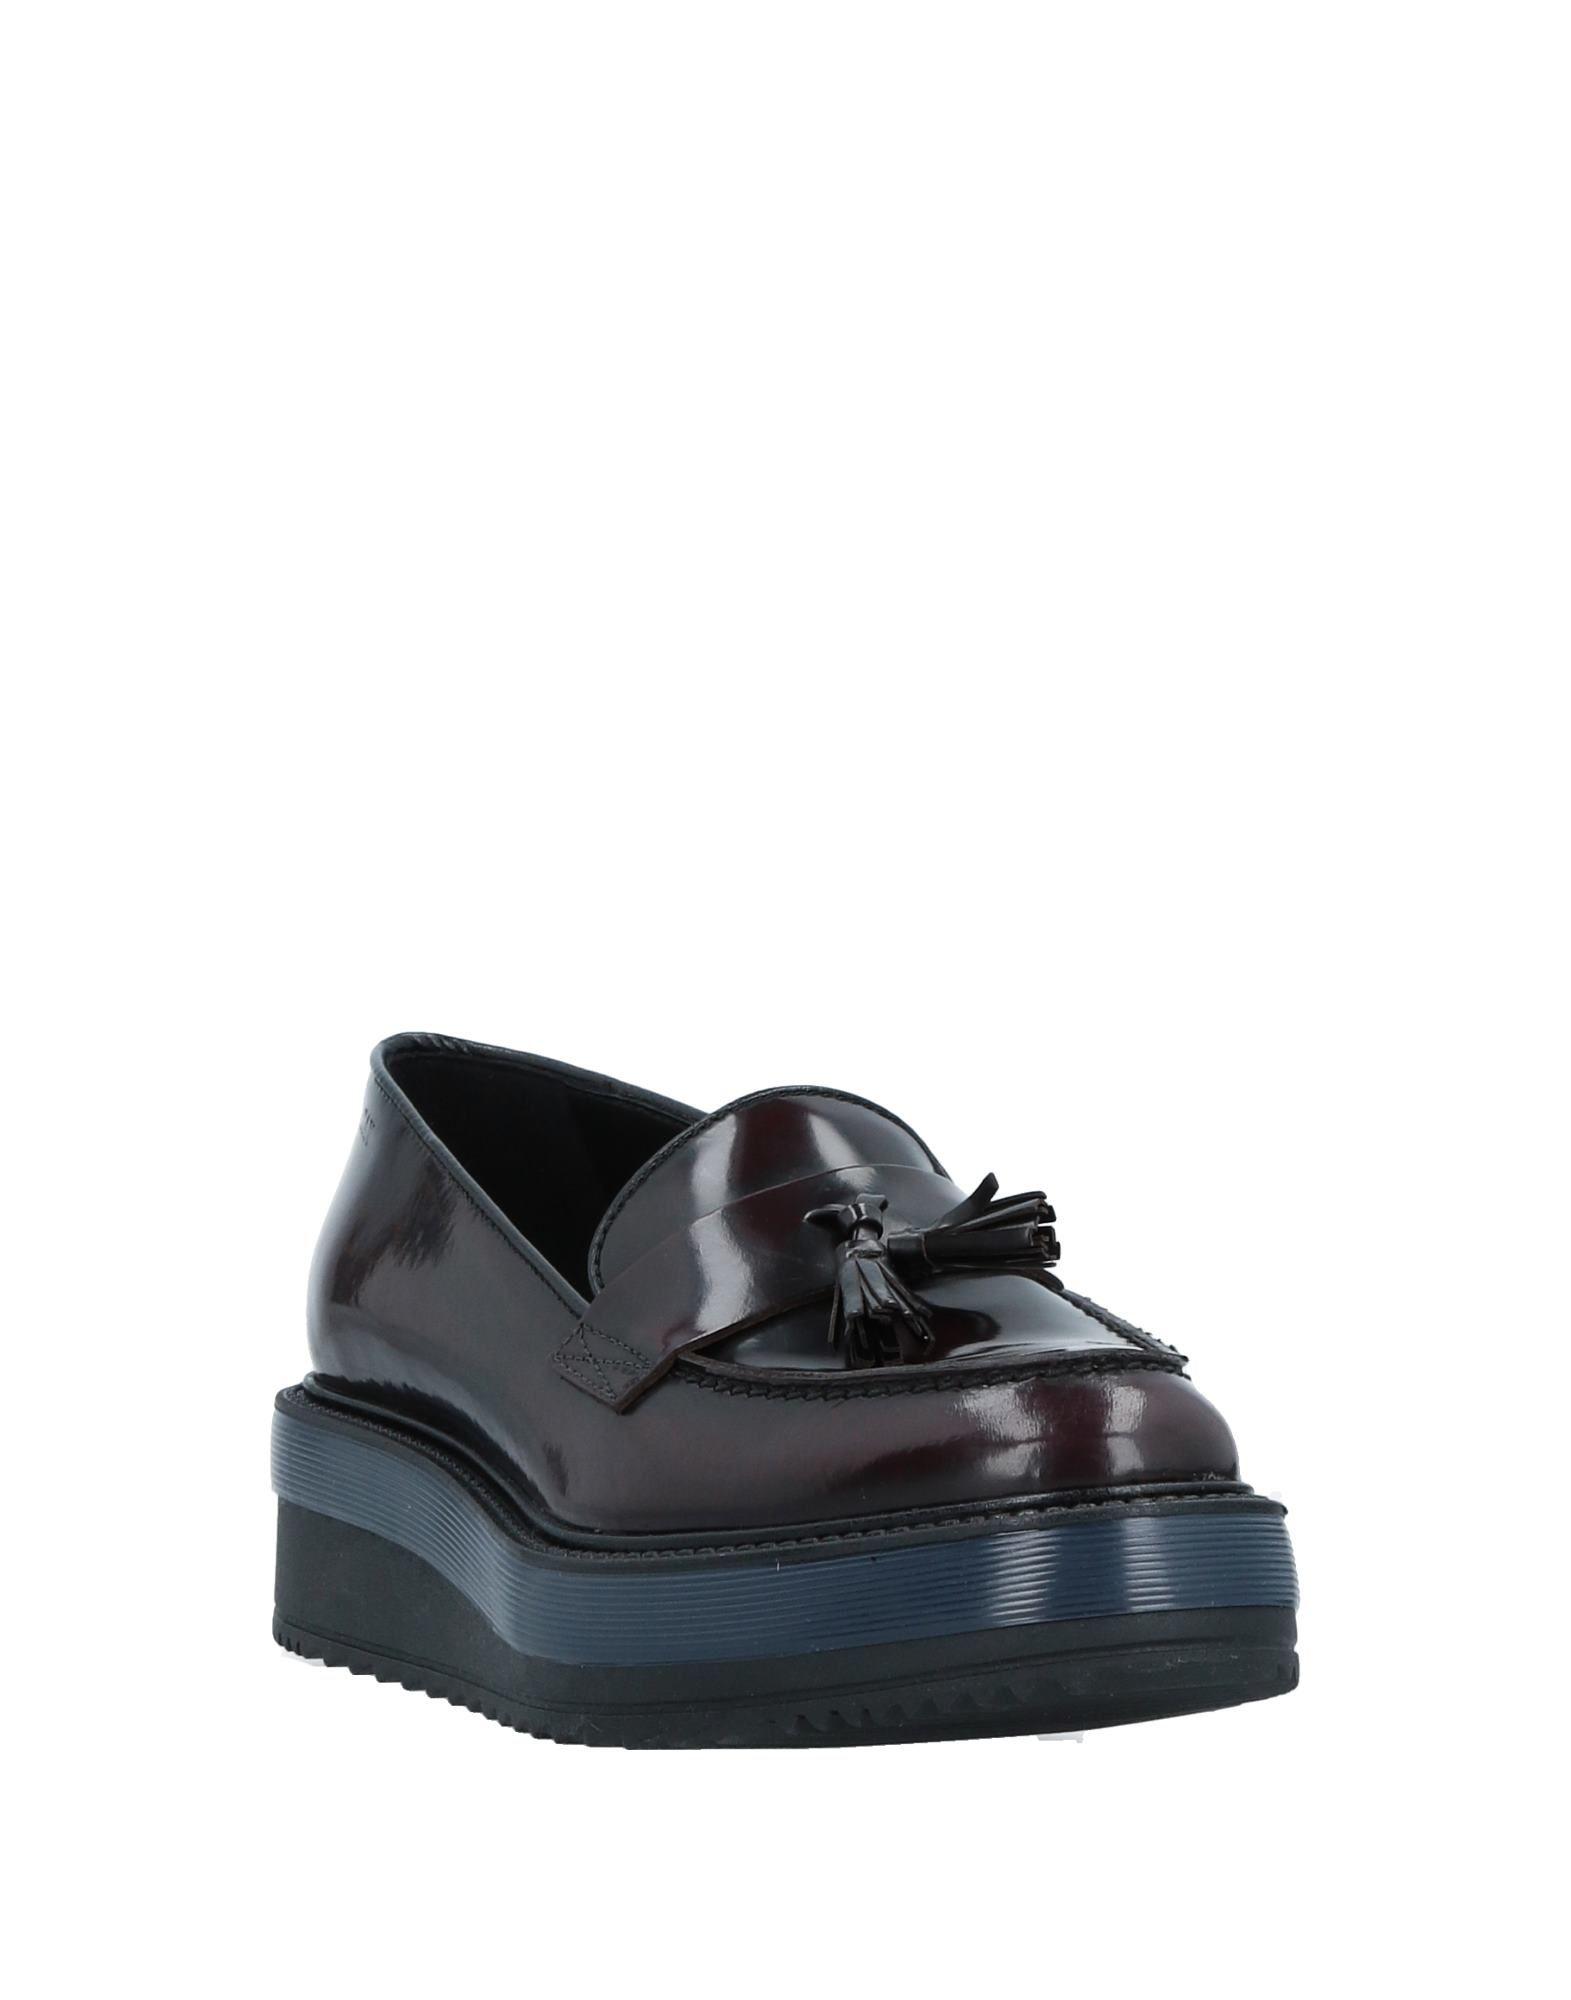 Sax  Mokassins Damen  Sax 11344836HR Gute Qualität beliebte Schuhe 41efa2